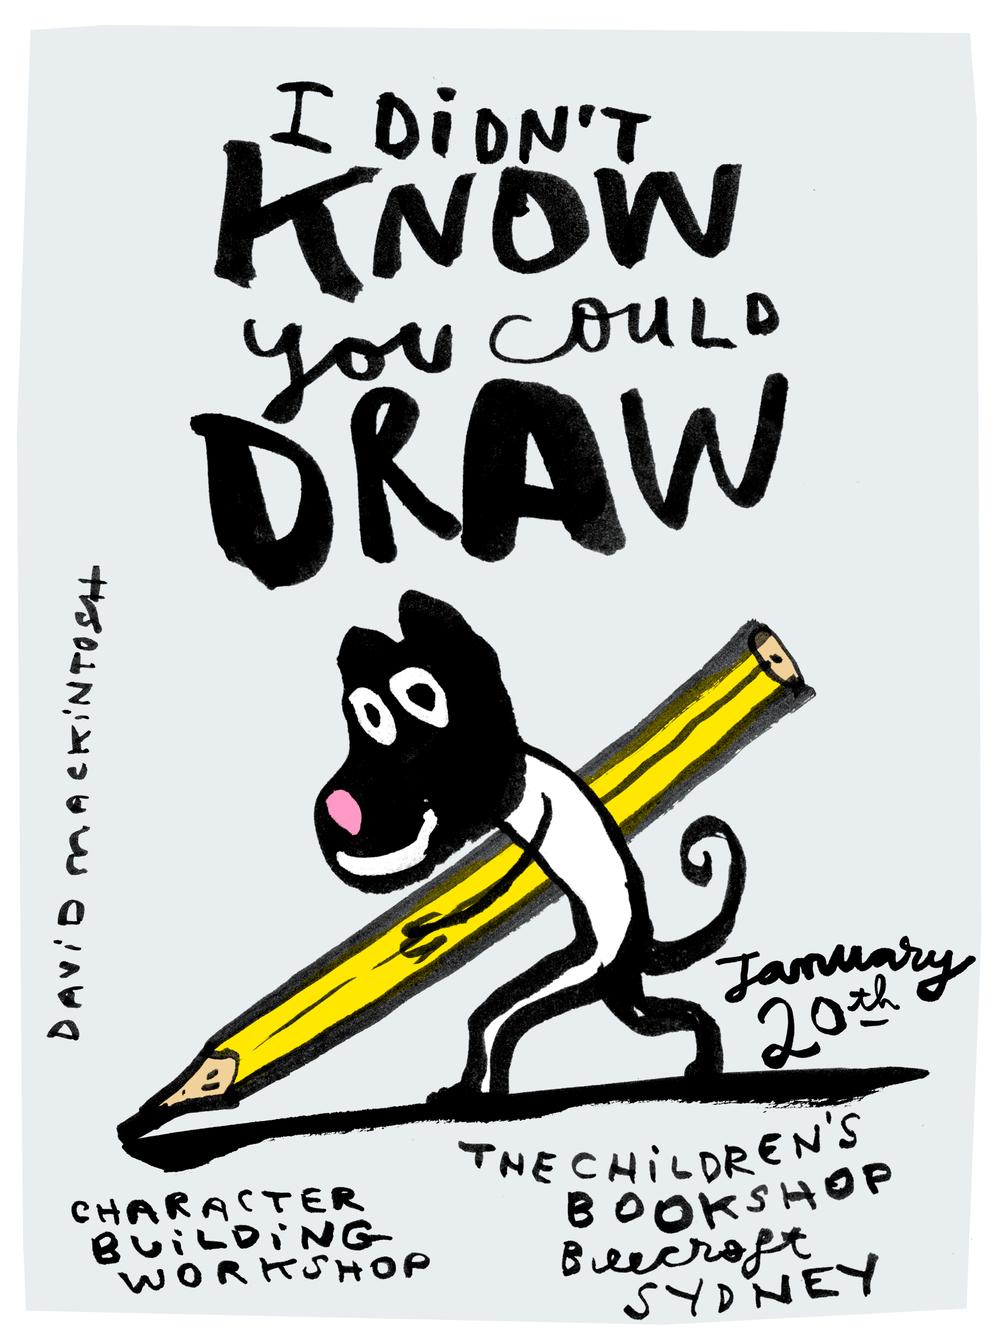 david mackintosh drawing workshop sydney